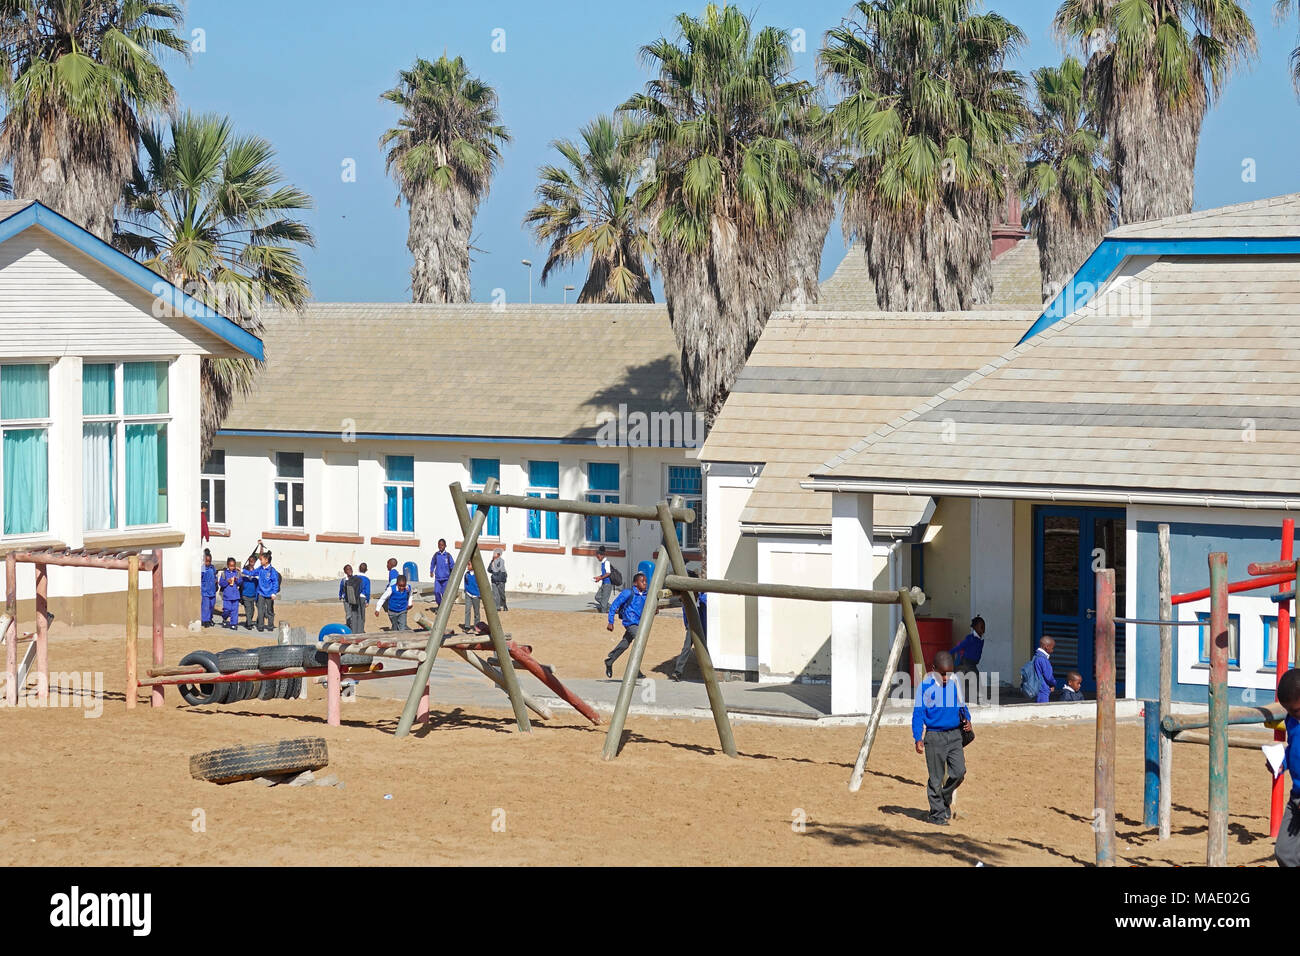 Namibia Swakopmund Namib Primary School - Stock Image